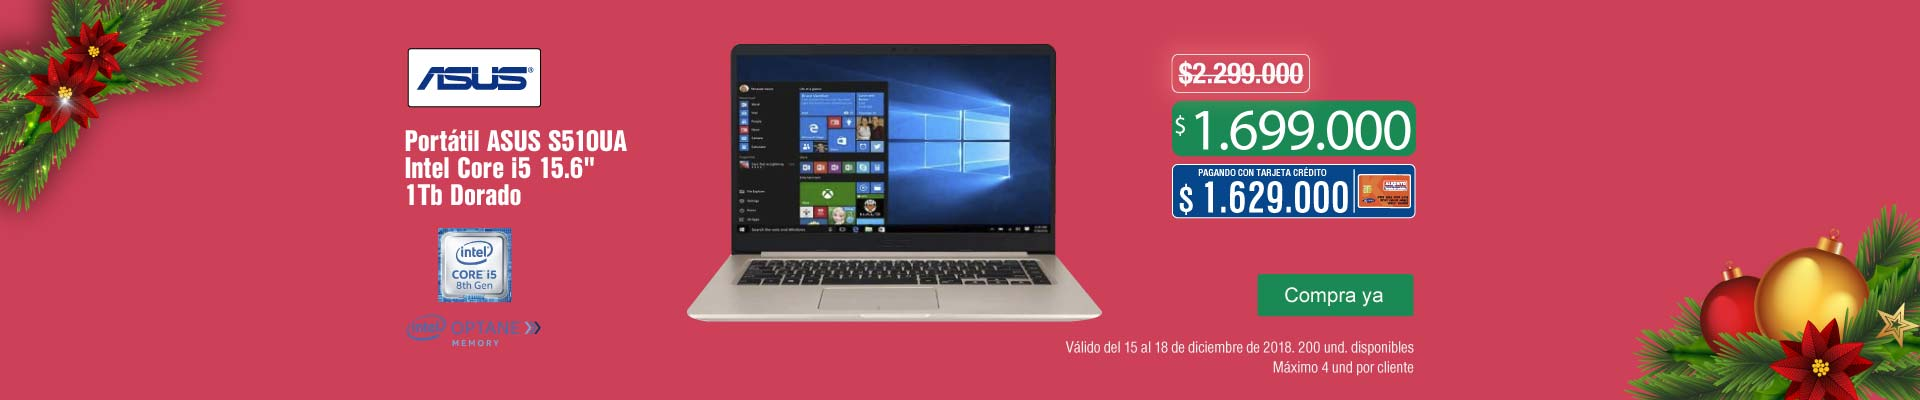 KT-CYBERSANTA-PPAL-4-computadores y tablets-PP---Asus-Portátil S510UA-dic15